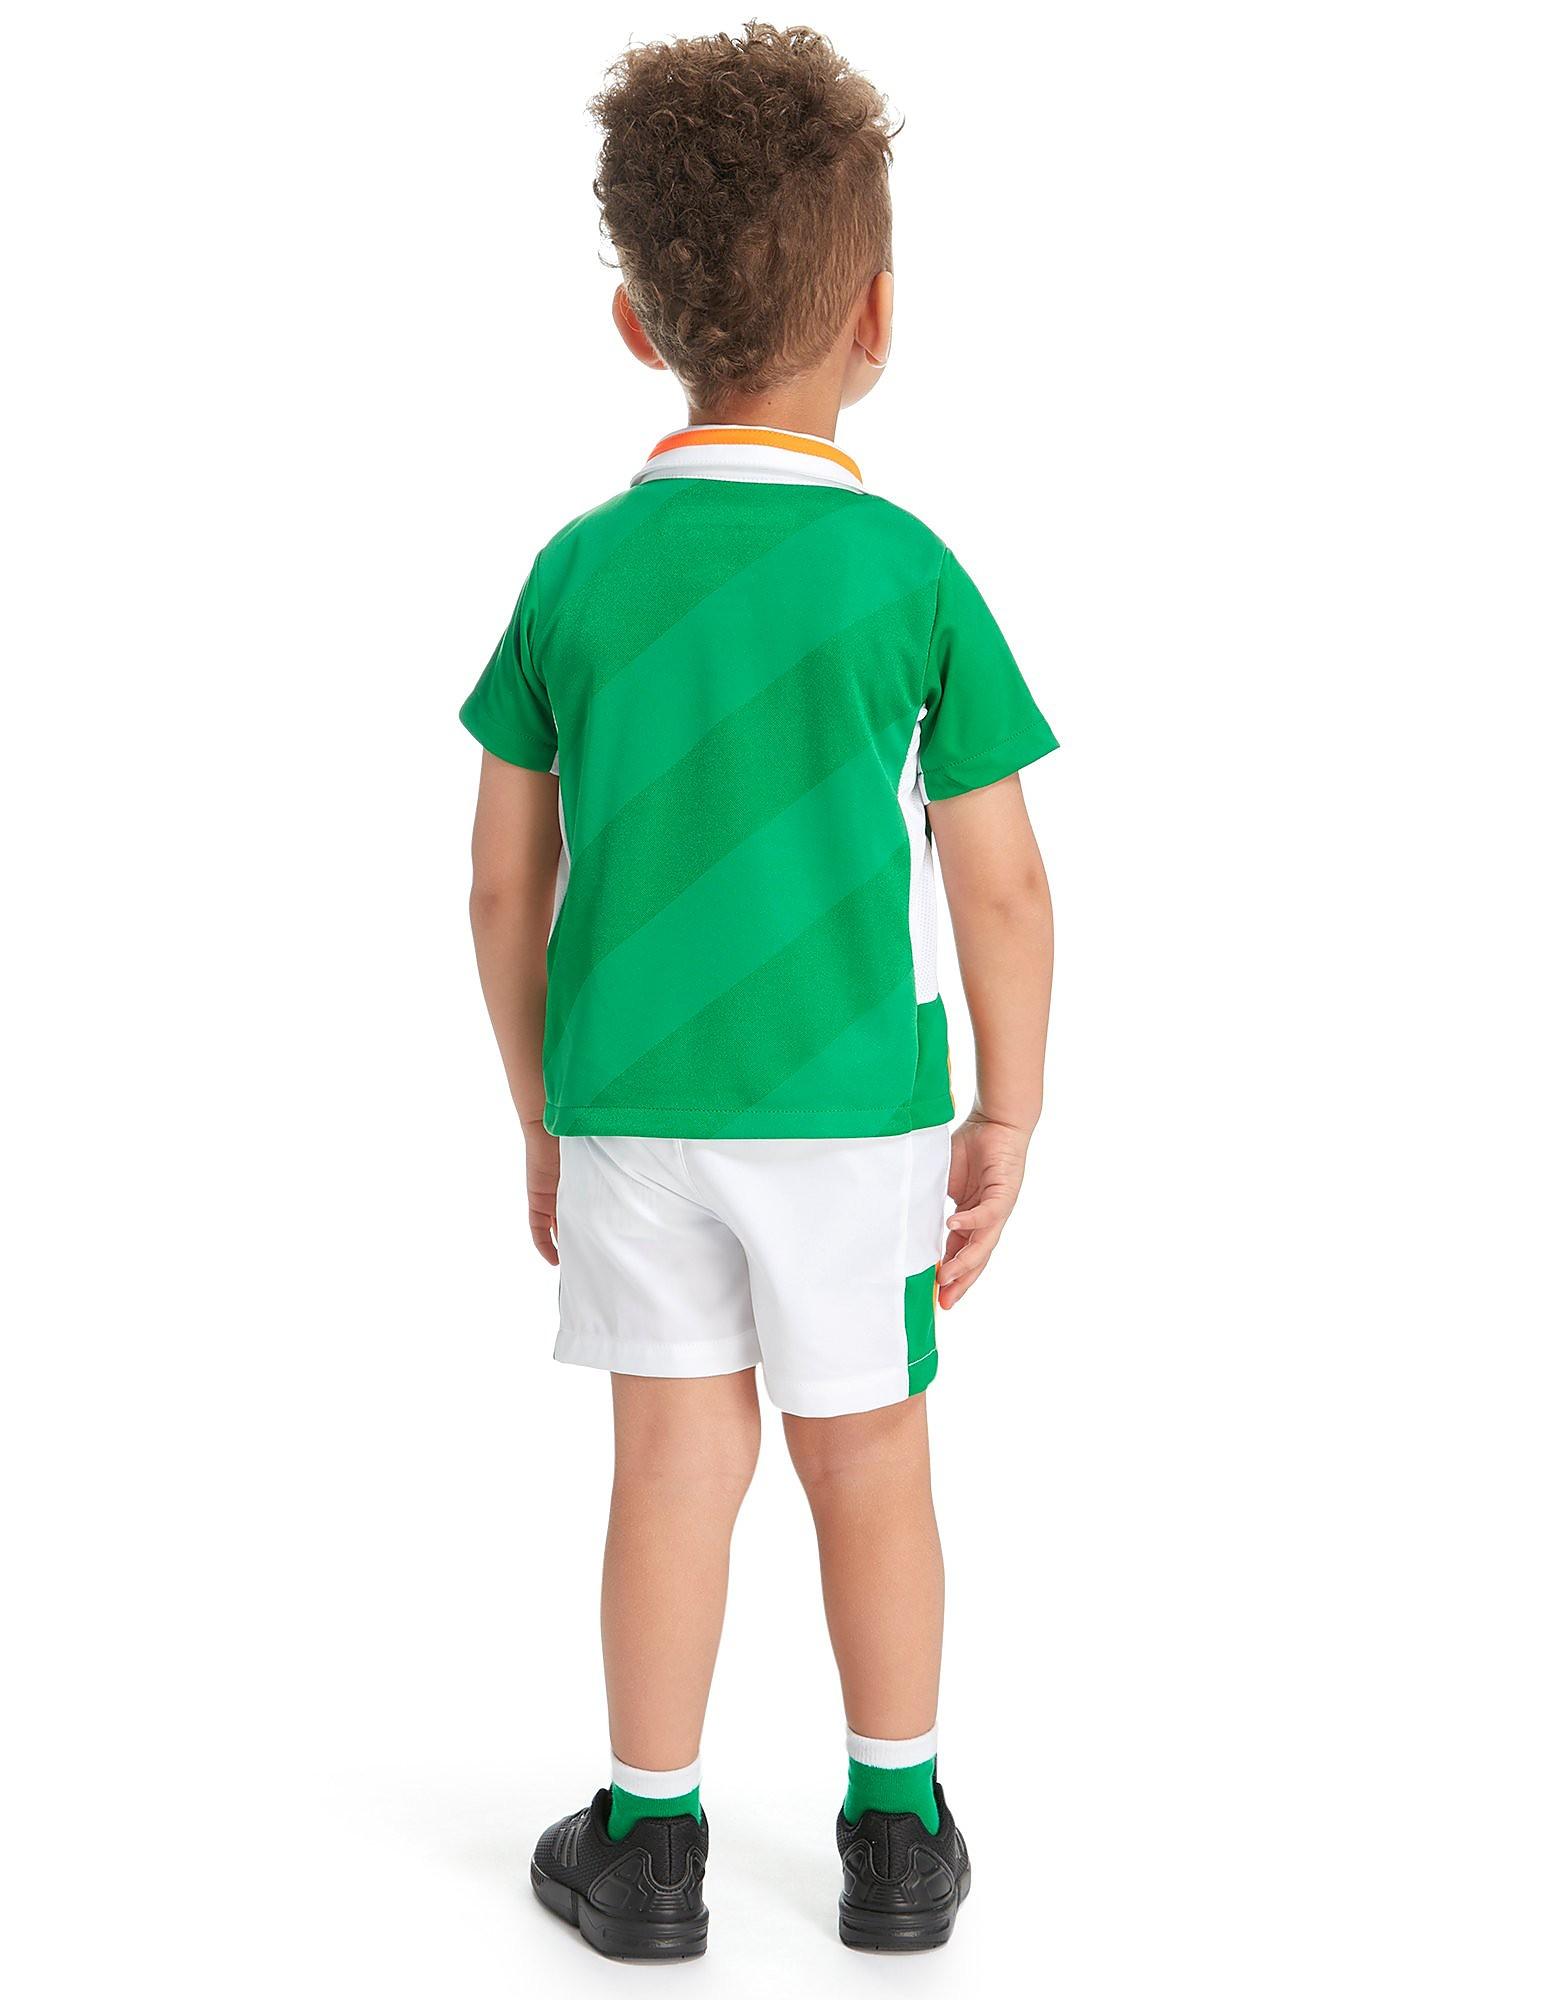 Umbro Republic of Ireland 2016 Home Kit Infant